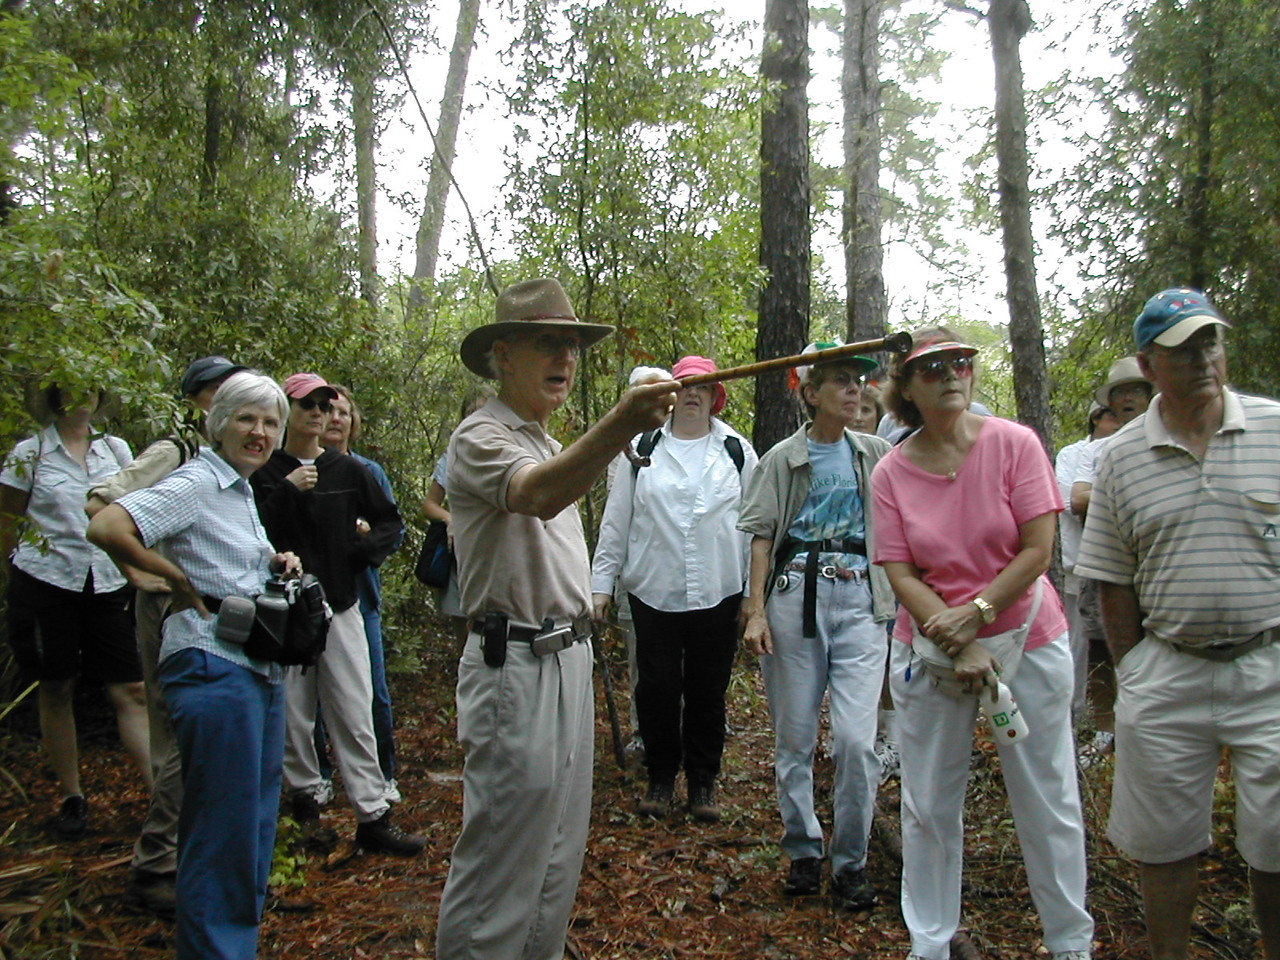 Kenneth Smith offers interpretation of sights along the Florida Trail<br /> PHOTO CREDIT: Florida Trail Association / Sandra Friend